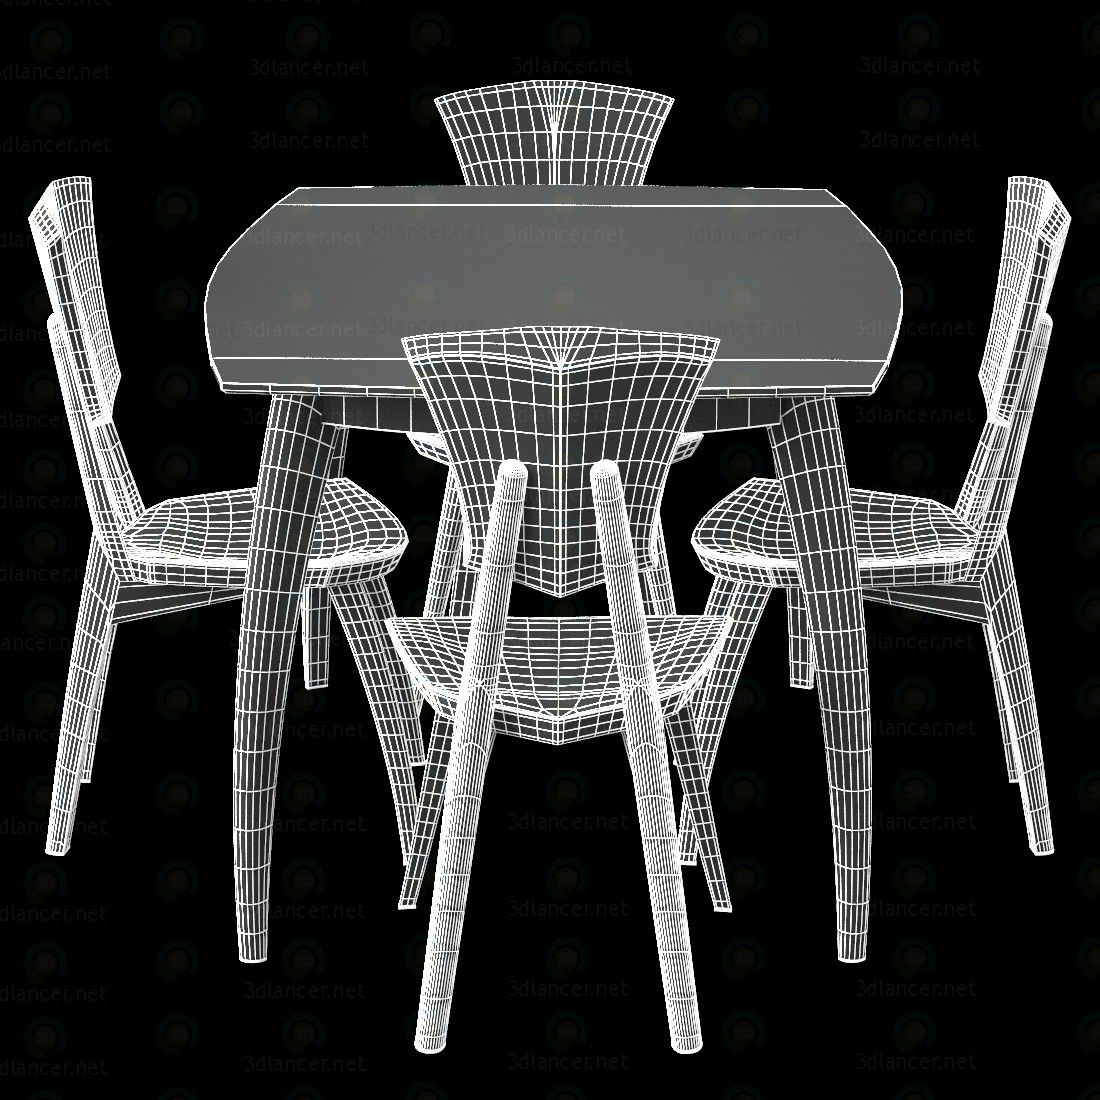 3d Lily Custom Glass Top Dining Table модель купити - зображення